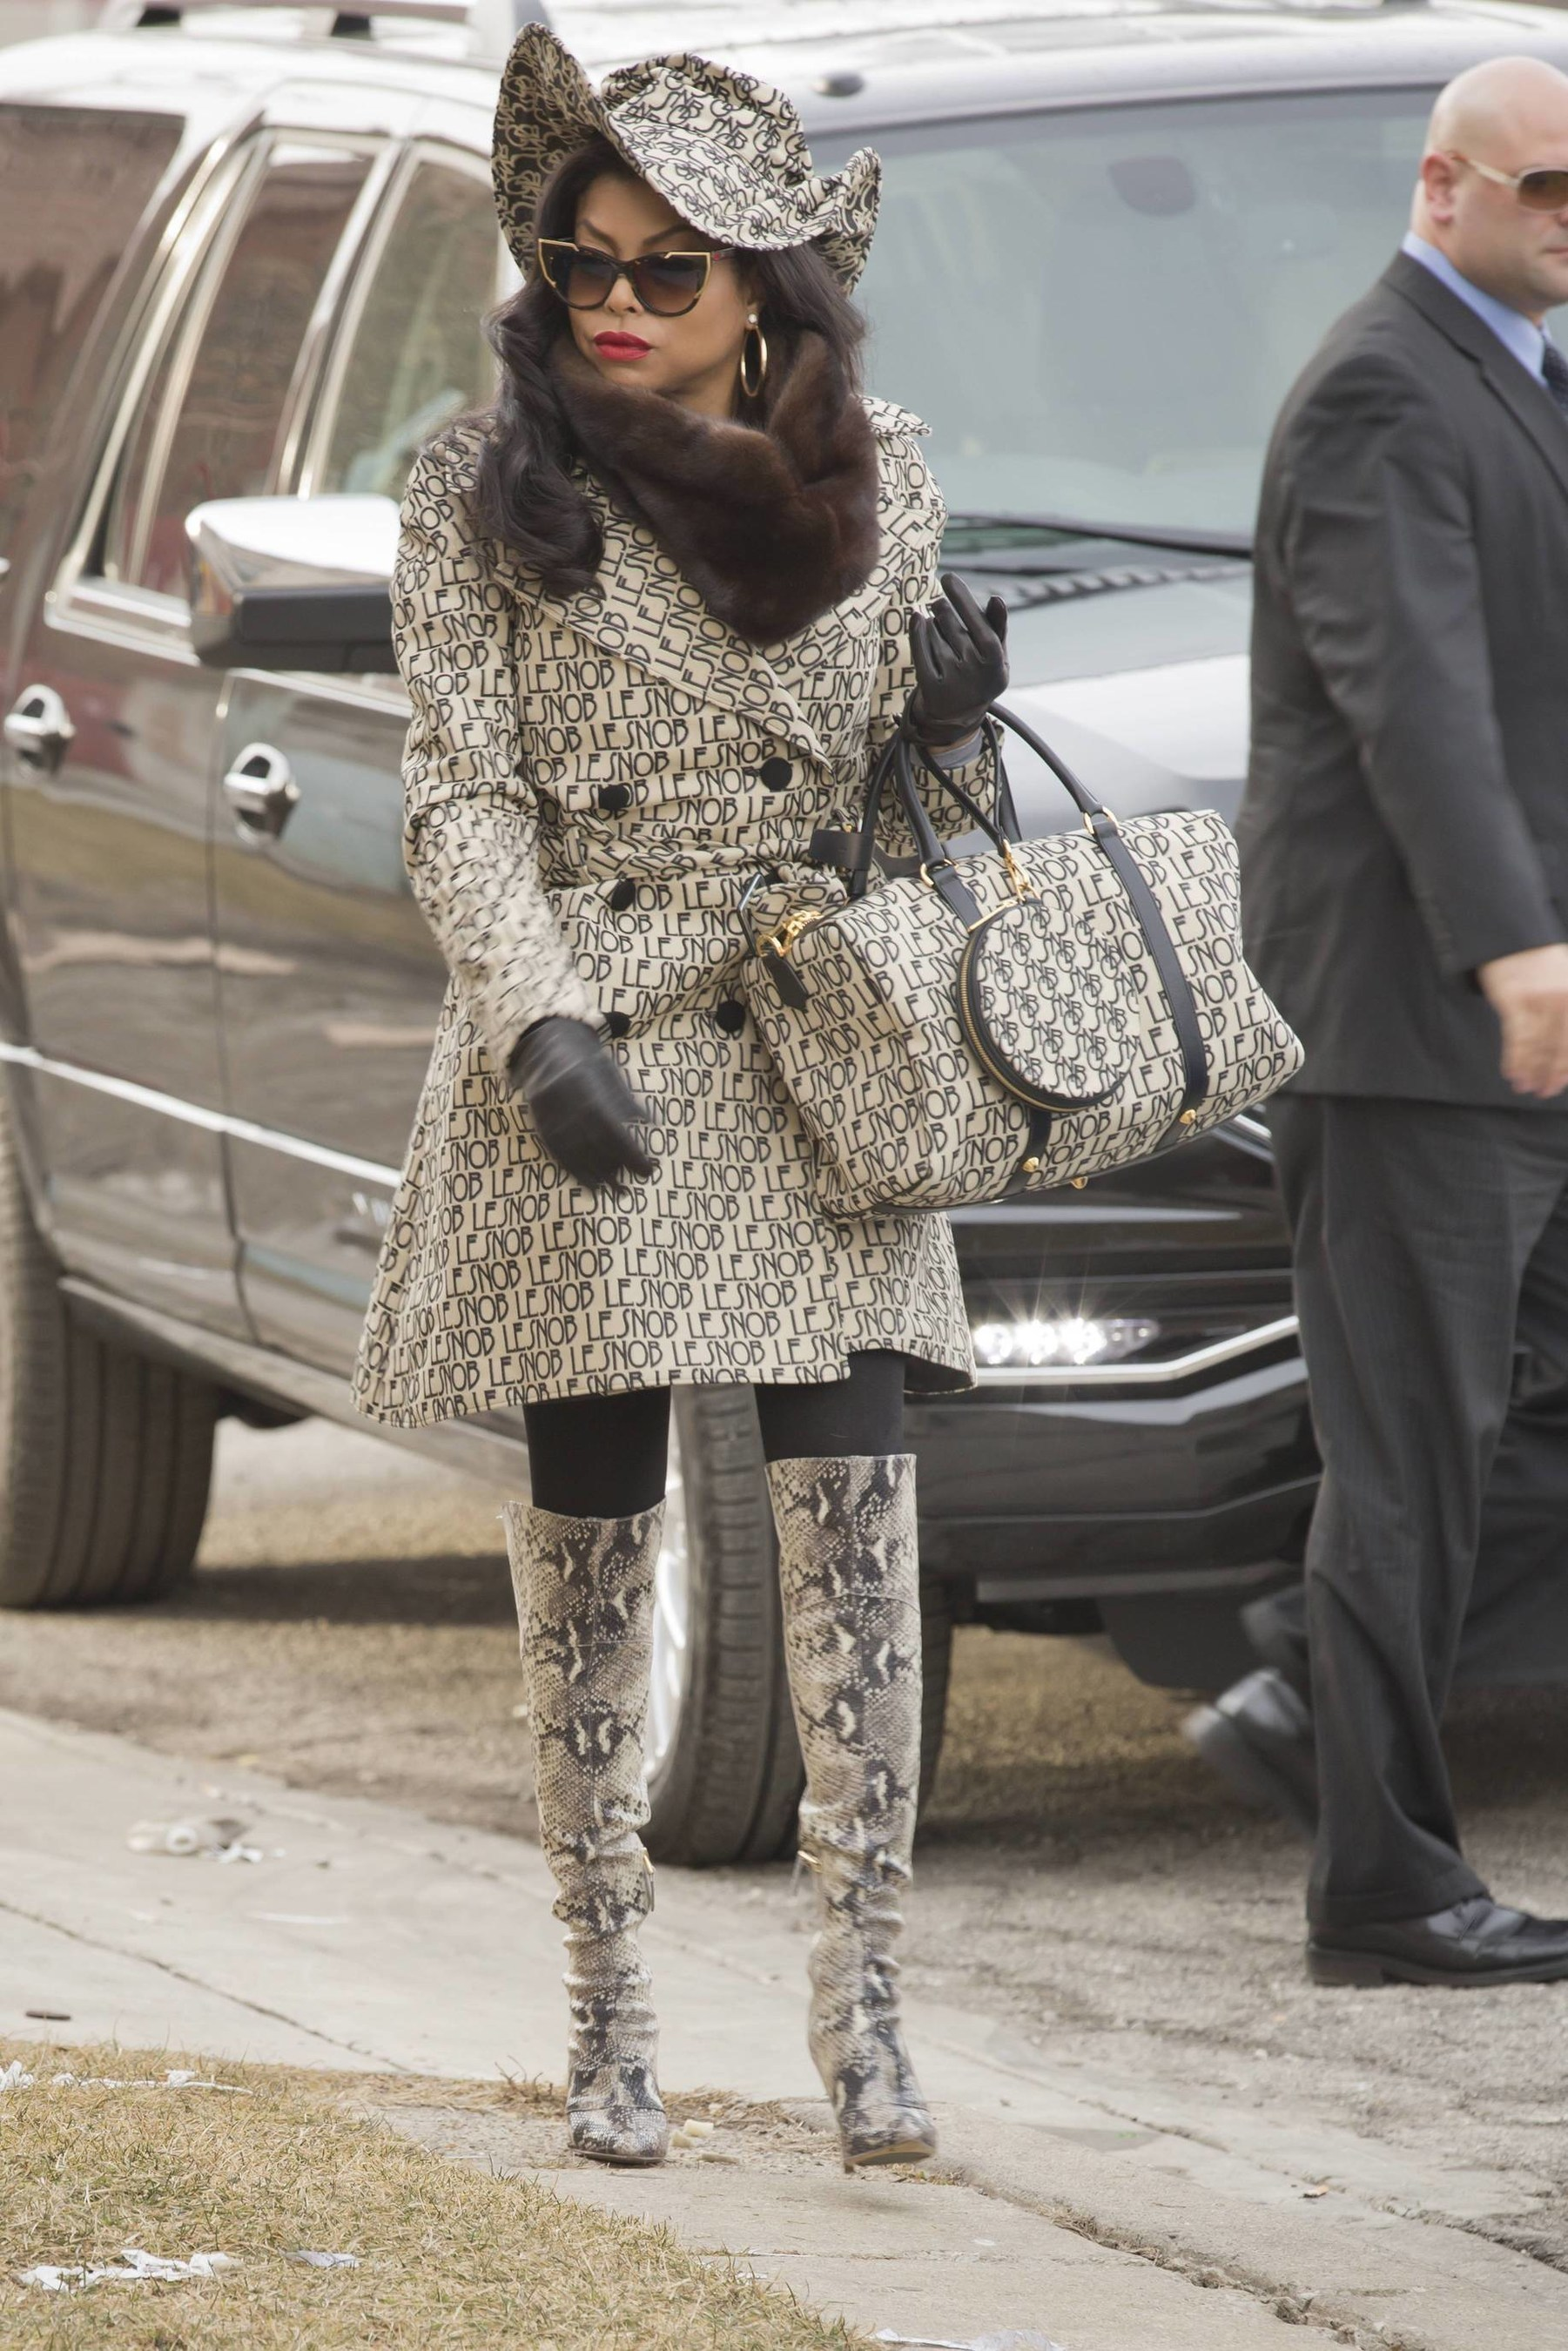 Taraji P. Henson as 'Cookie Lyons' Wears Le Snob on the Season Finale of 'Empire'